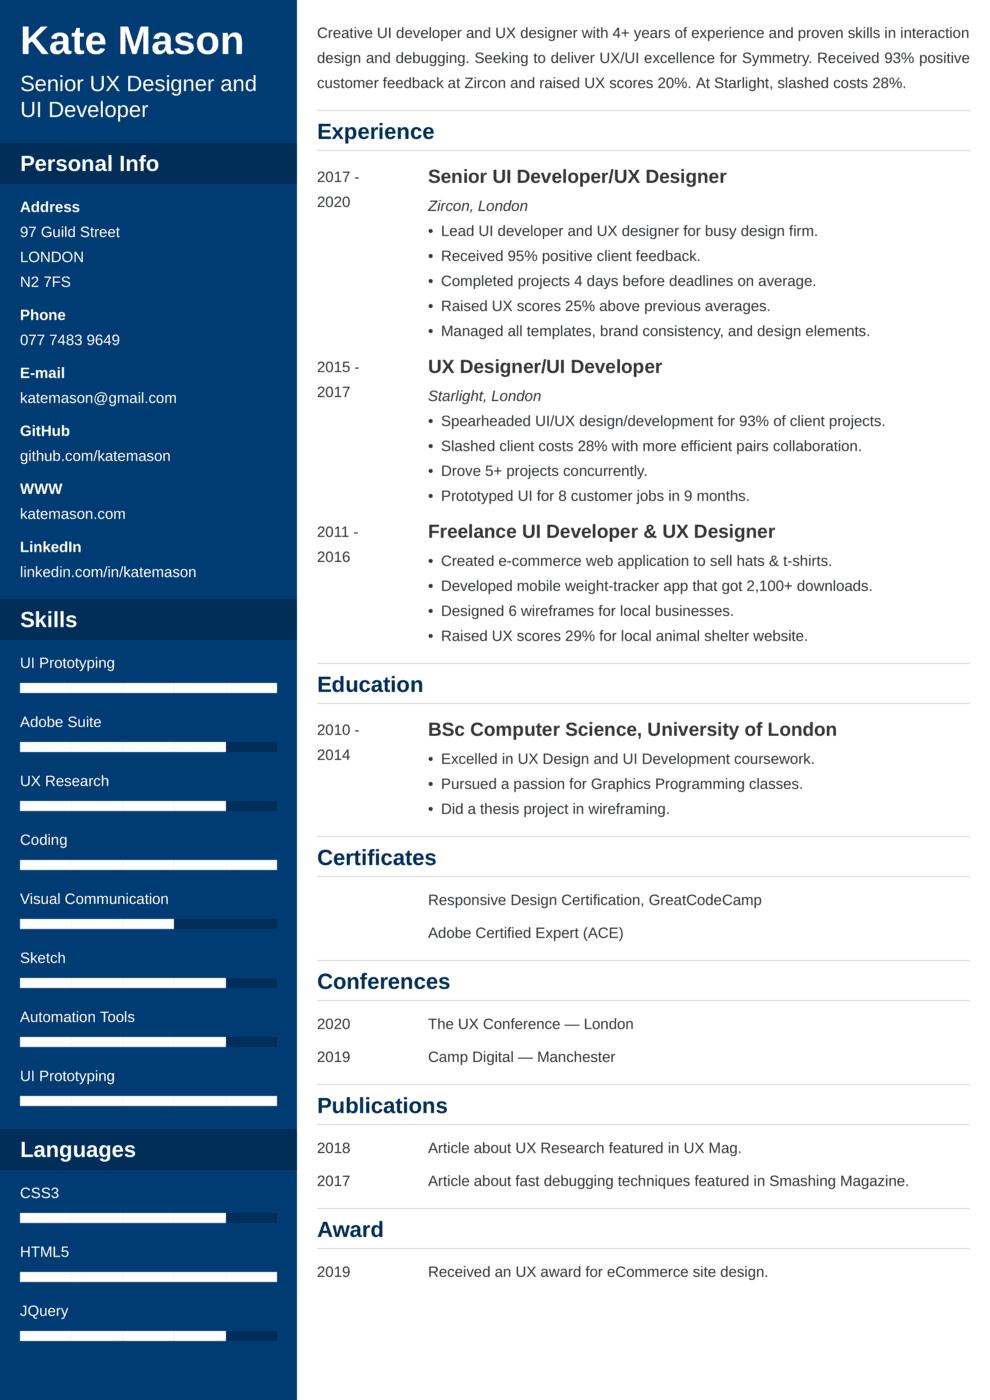 UX Designer & UI Developer CV Example